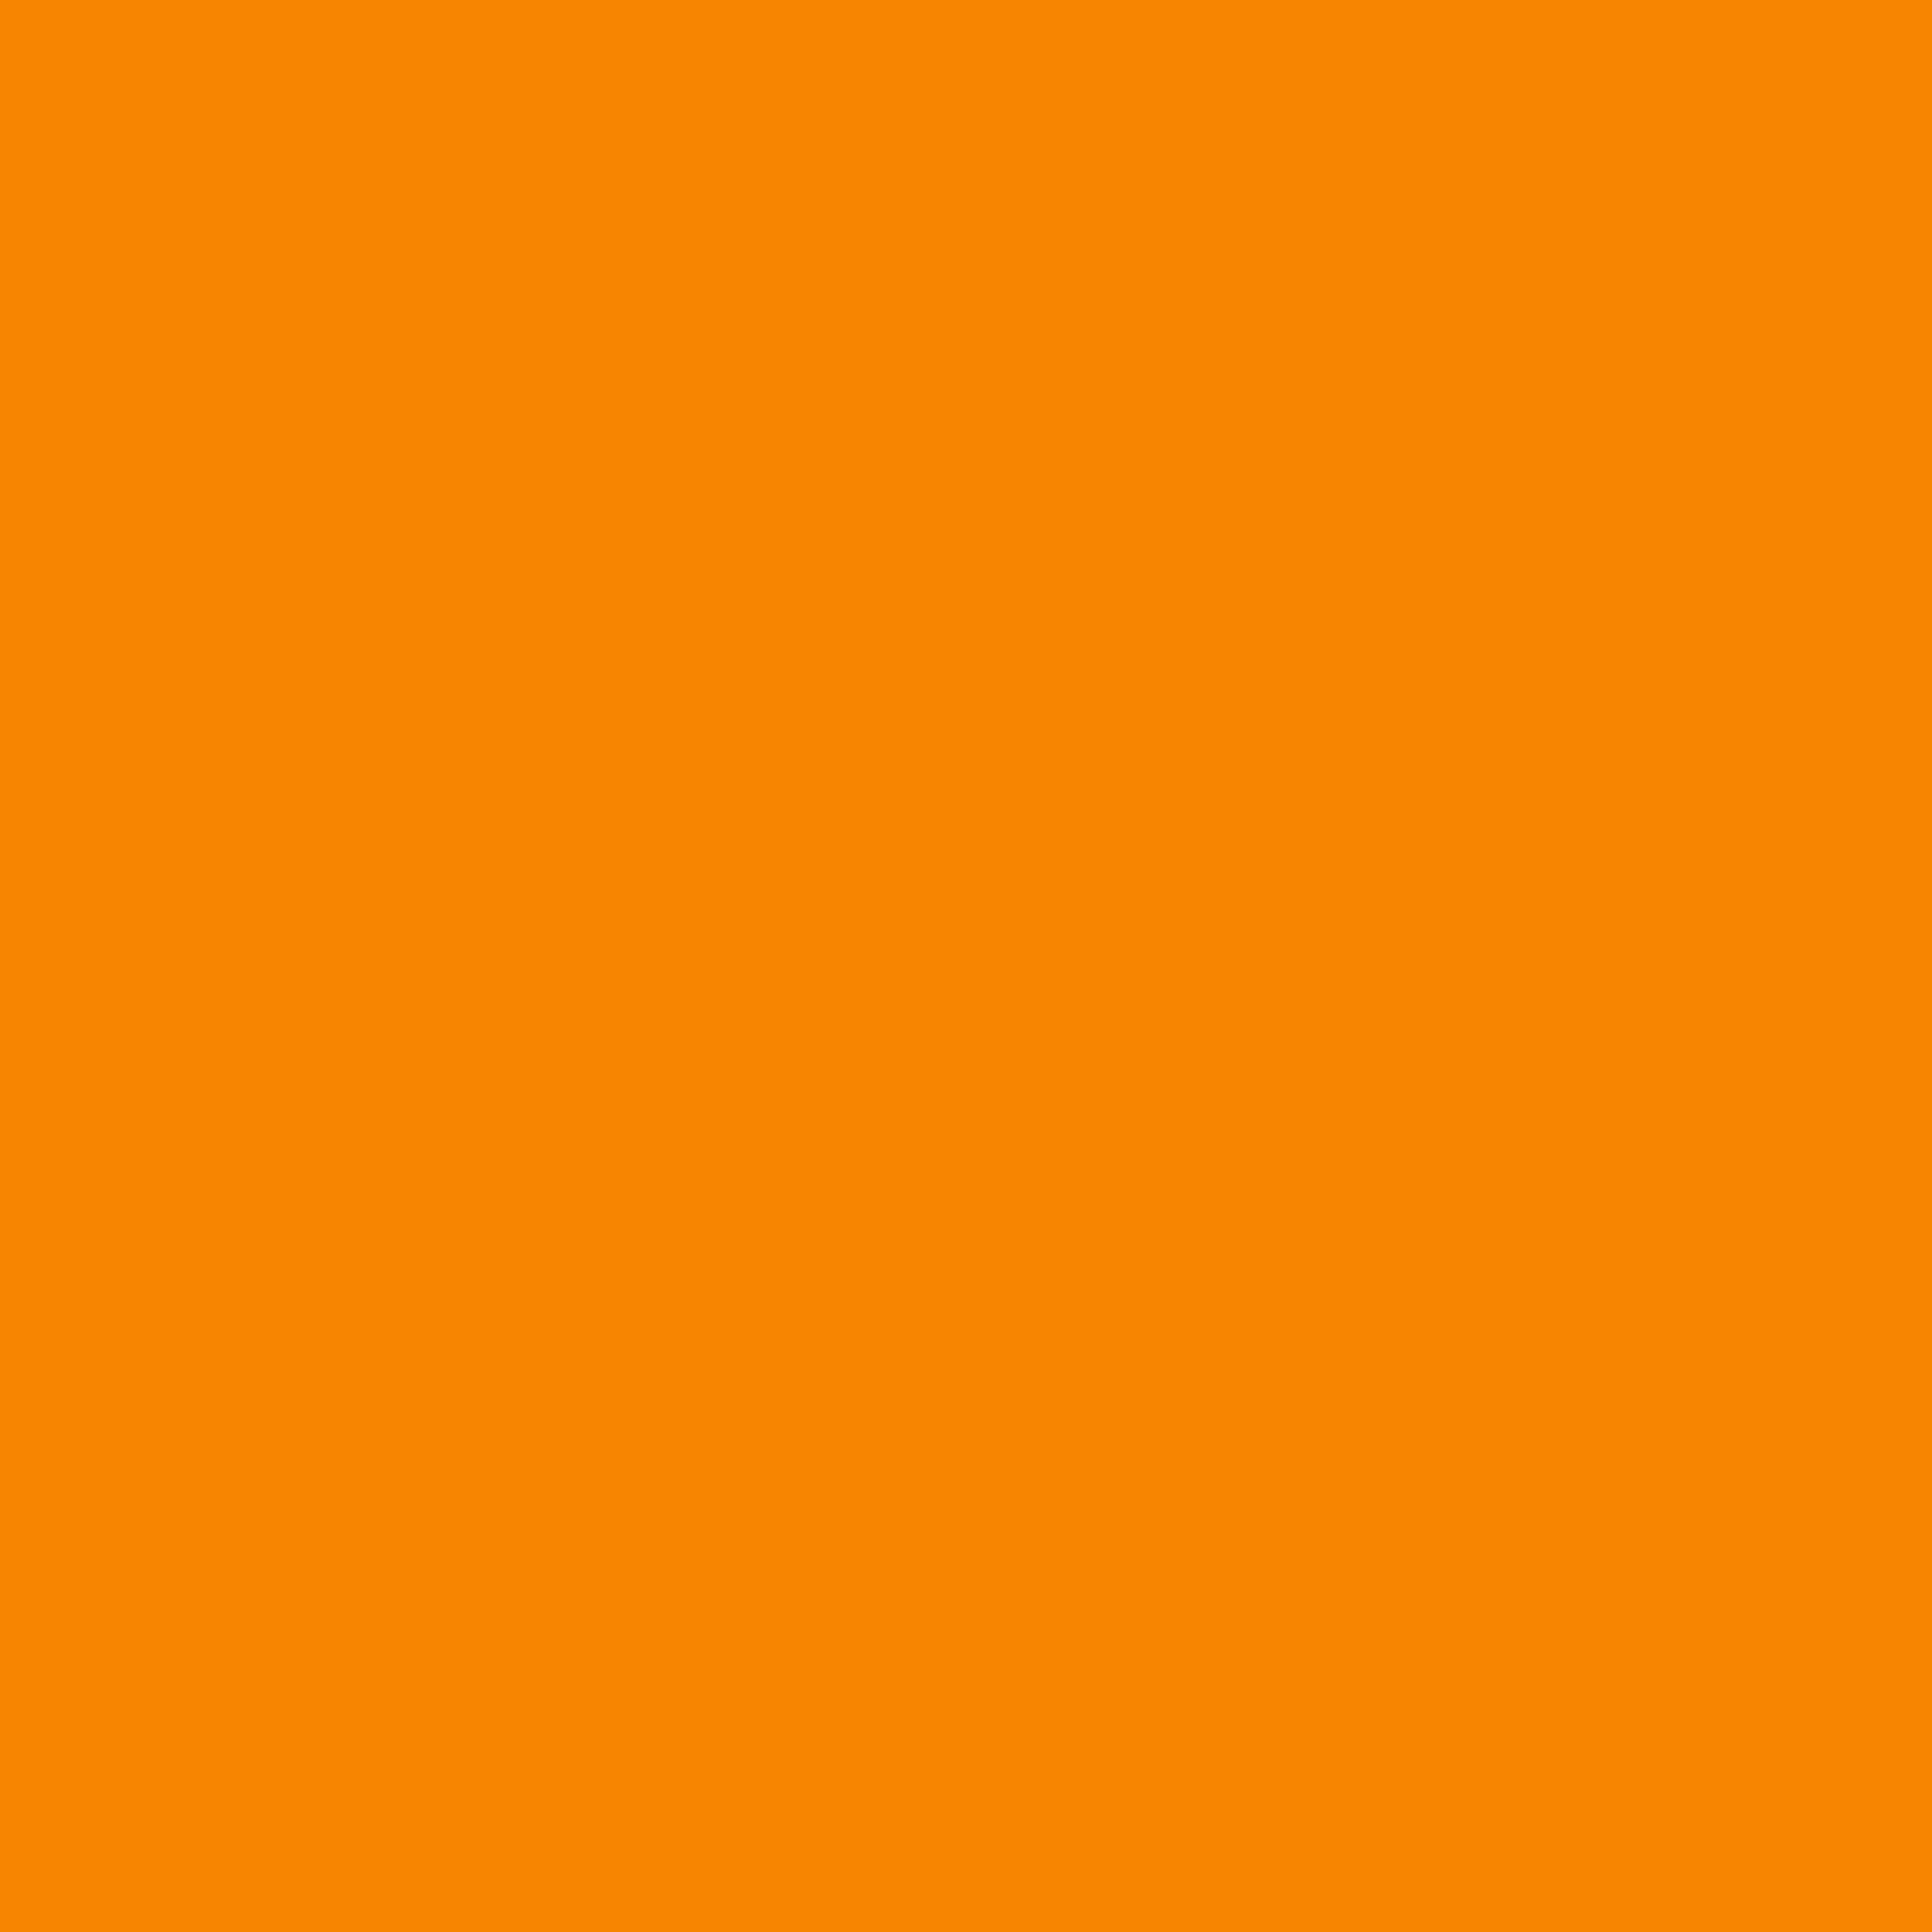 077A Tangerine